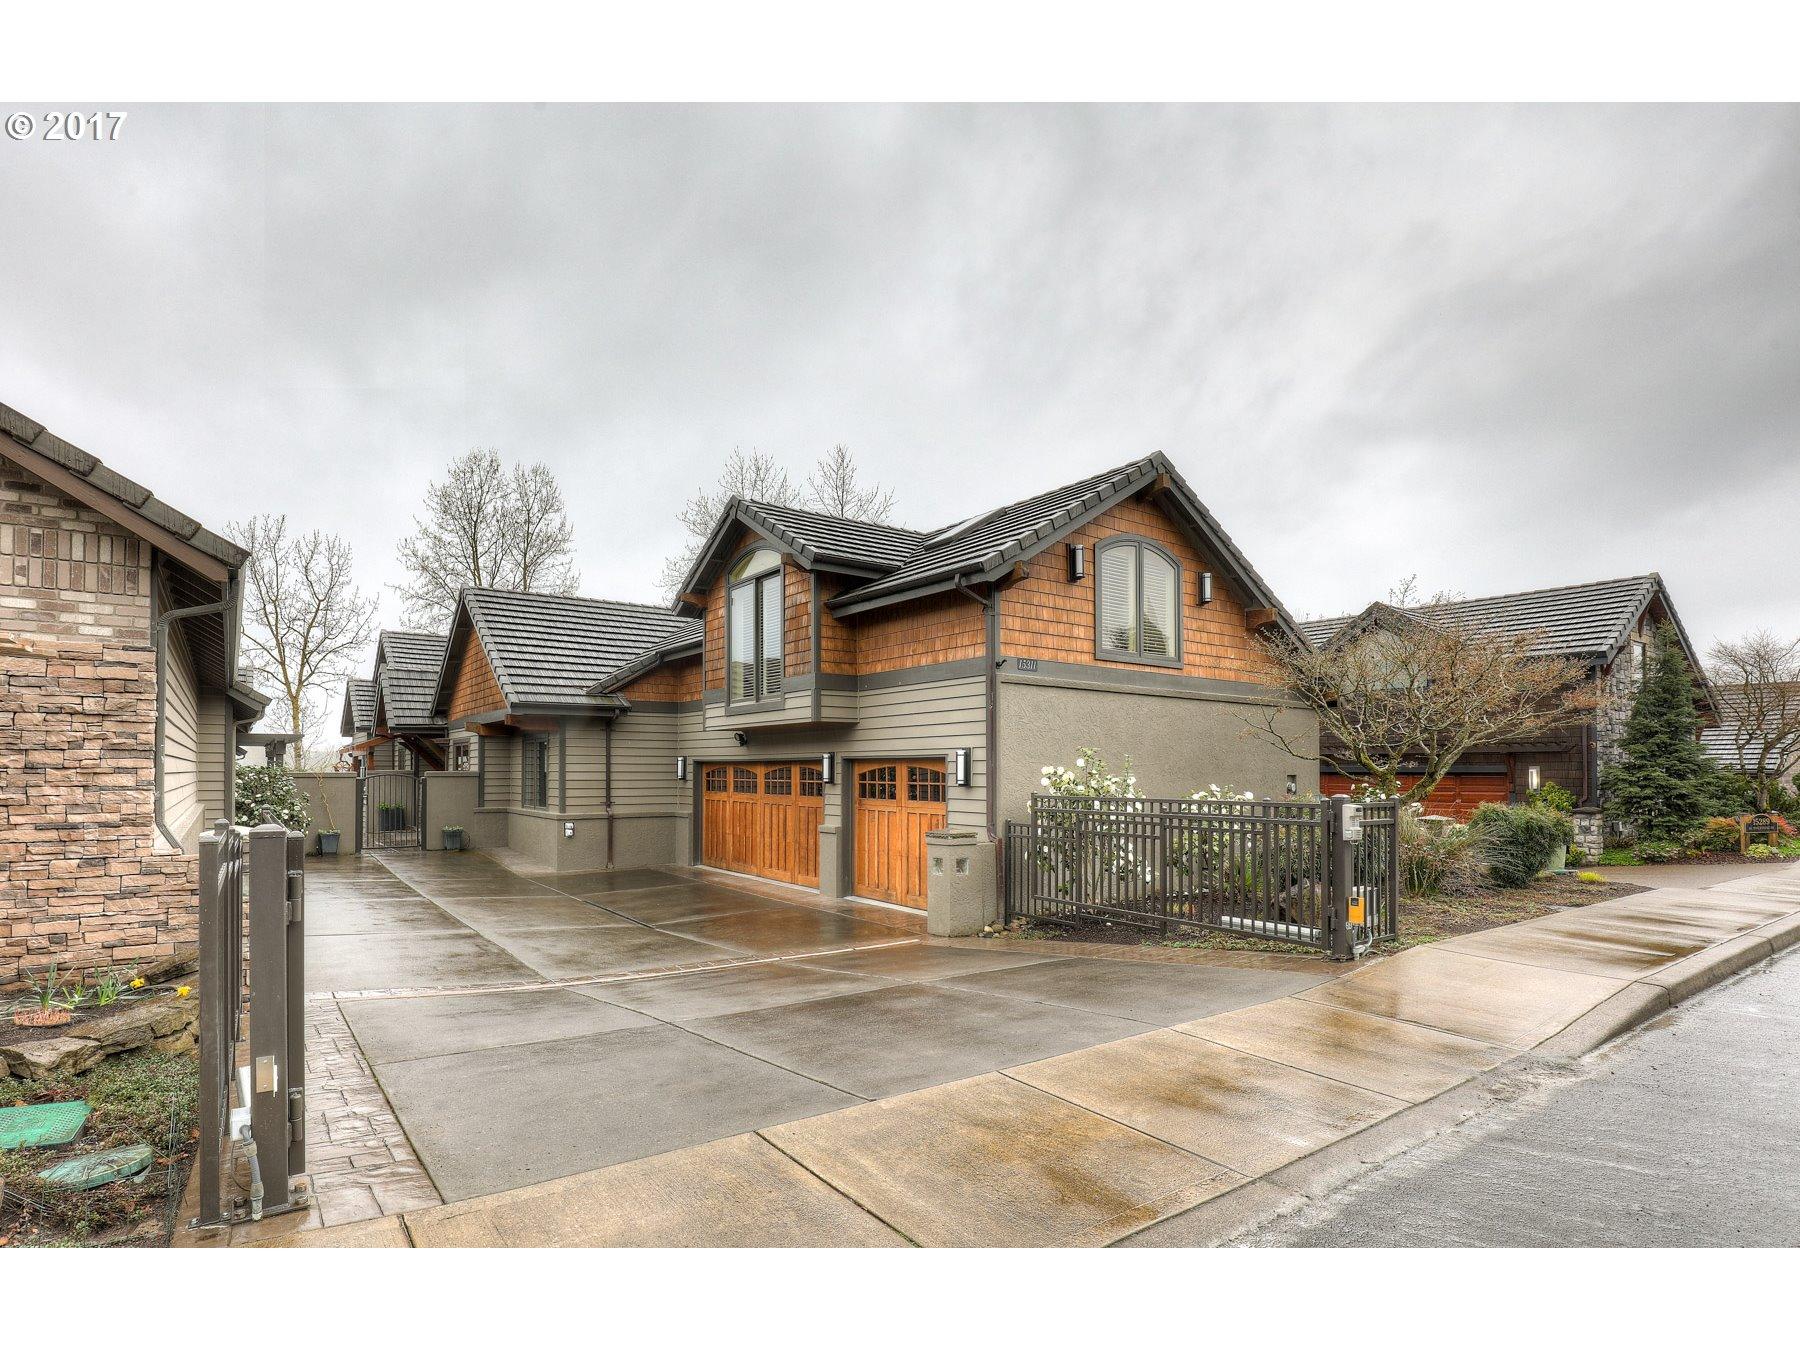 15311 SE RIVERSHORE DR, Vancouver, WA 98683